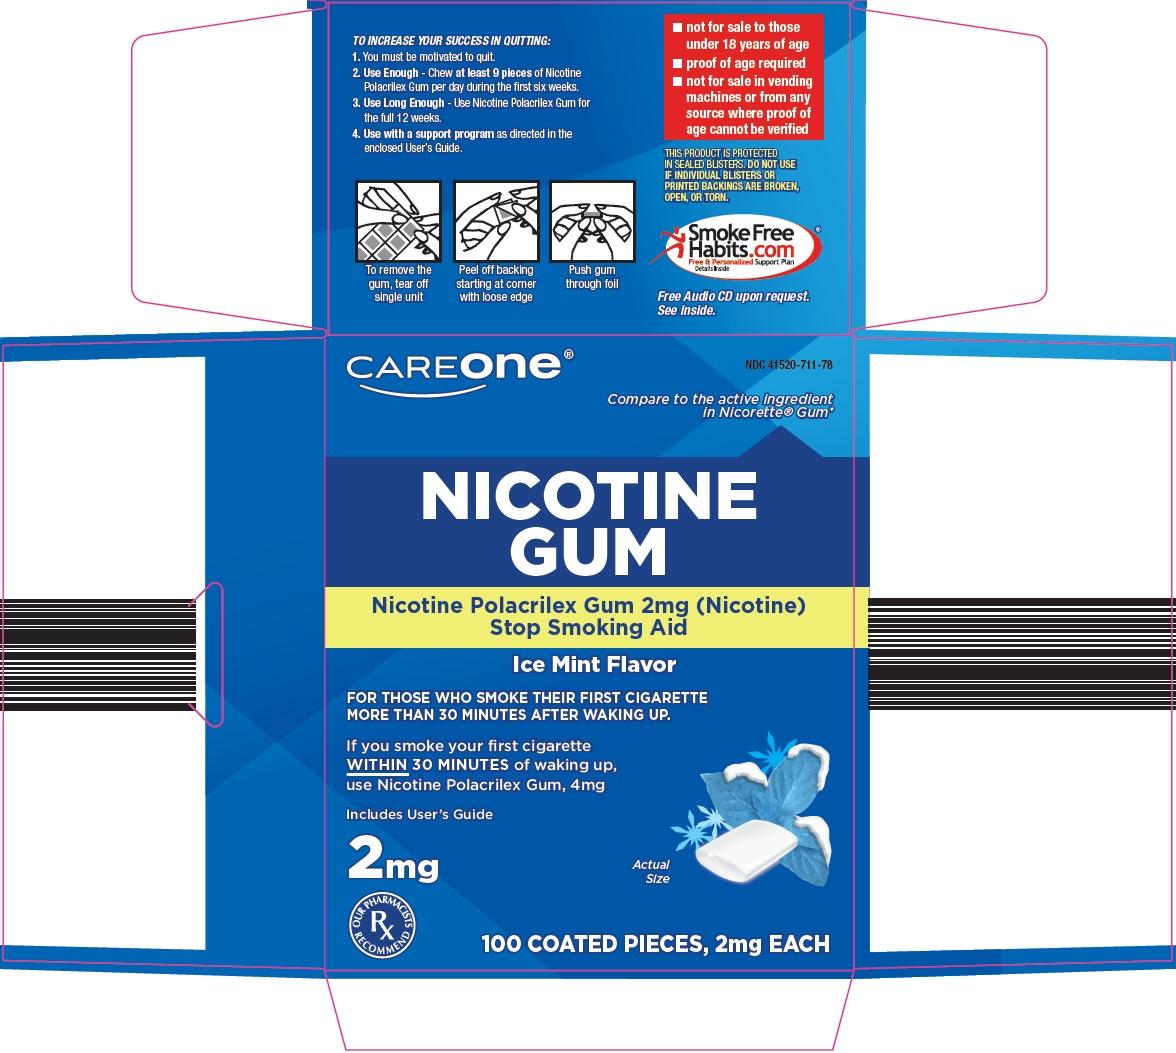 nicotine gum image 1